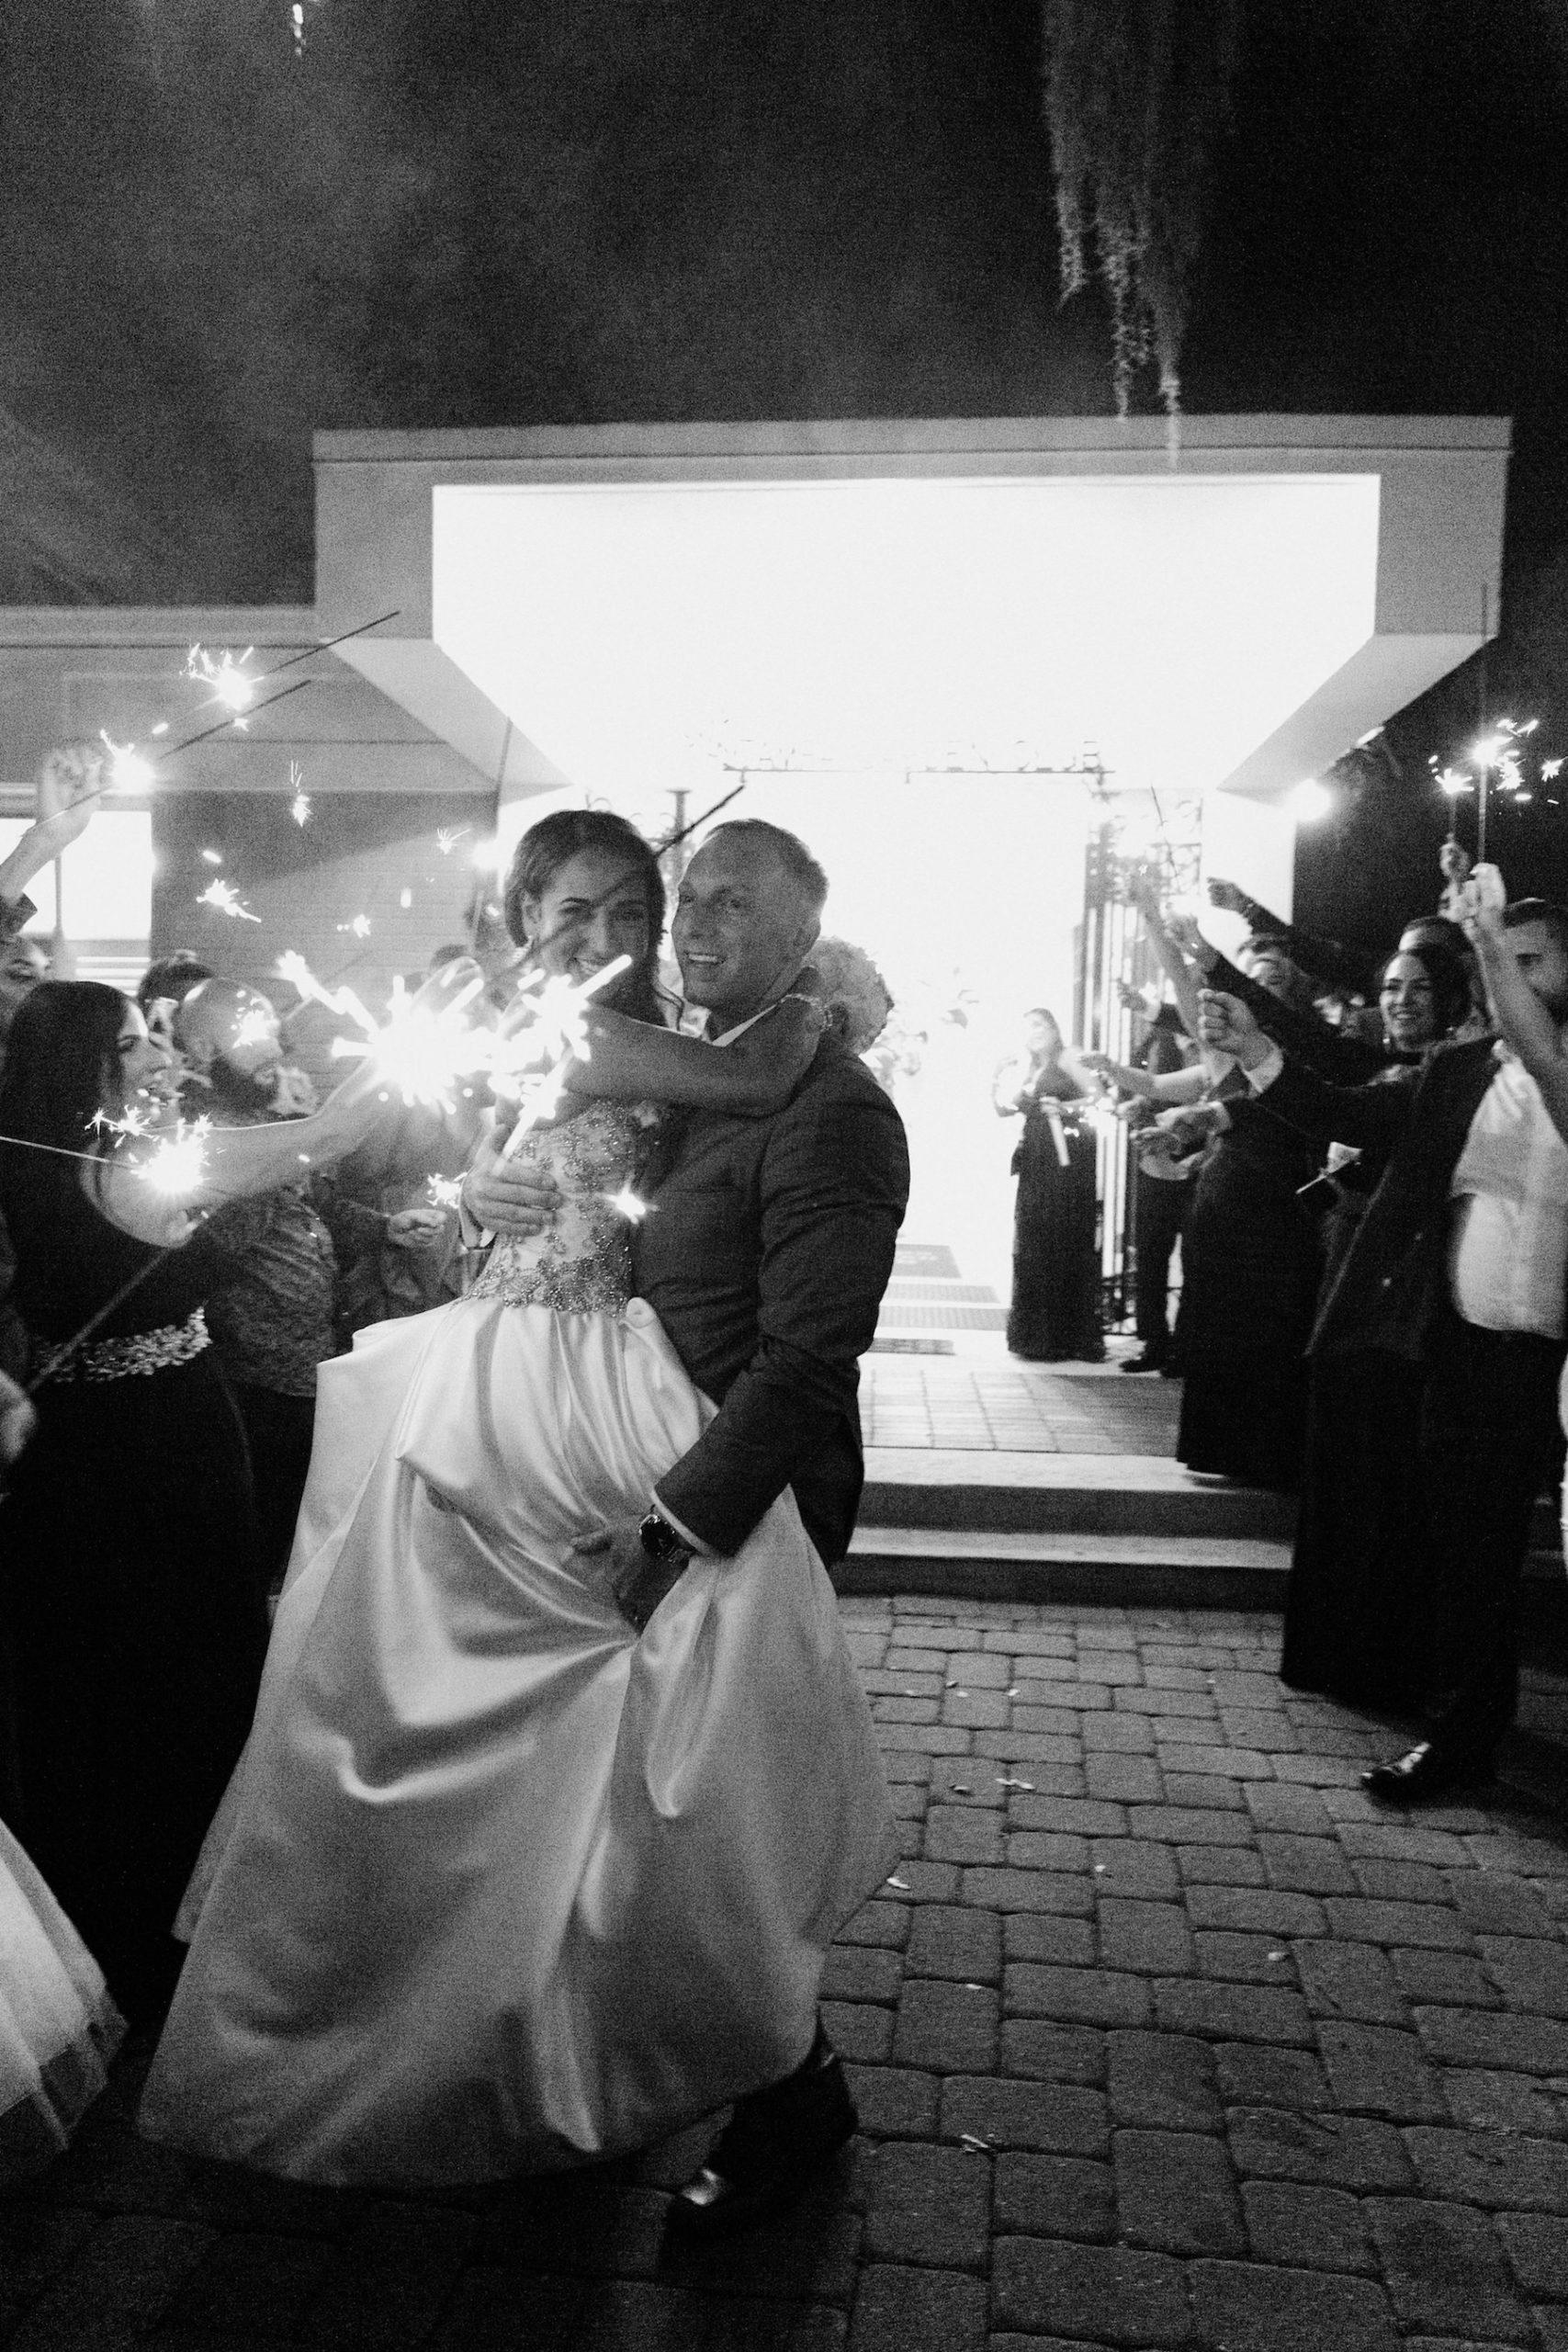 Black and White Bride and Groom Sparkler Exit Wedding Portrait | Wedding Venue Tampa Garden Club | Wedding Photographer Shauna and Jordon Photography | Wedding Dress Truly Forever Bridal